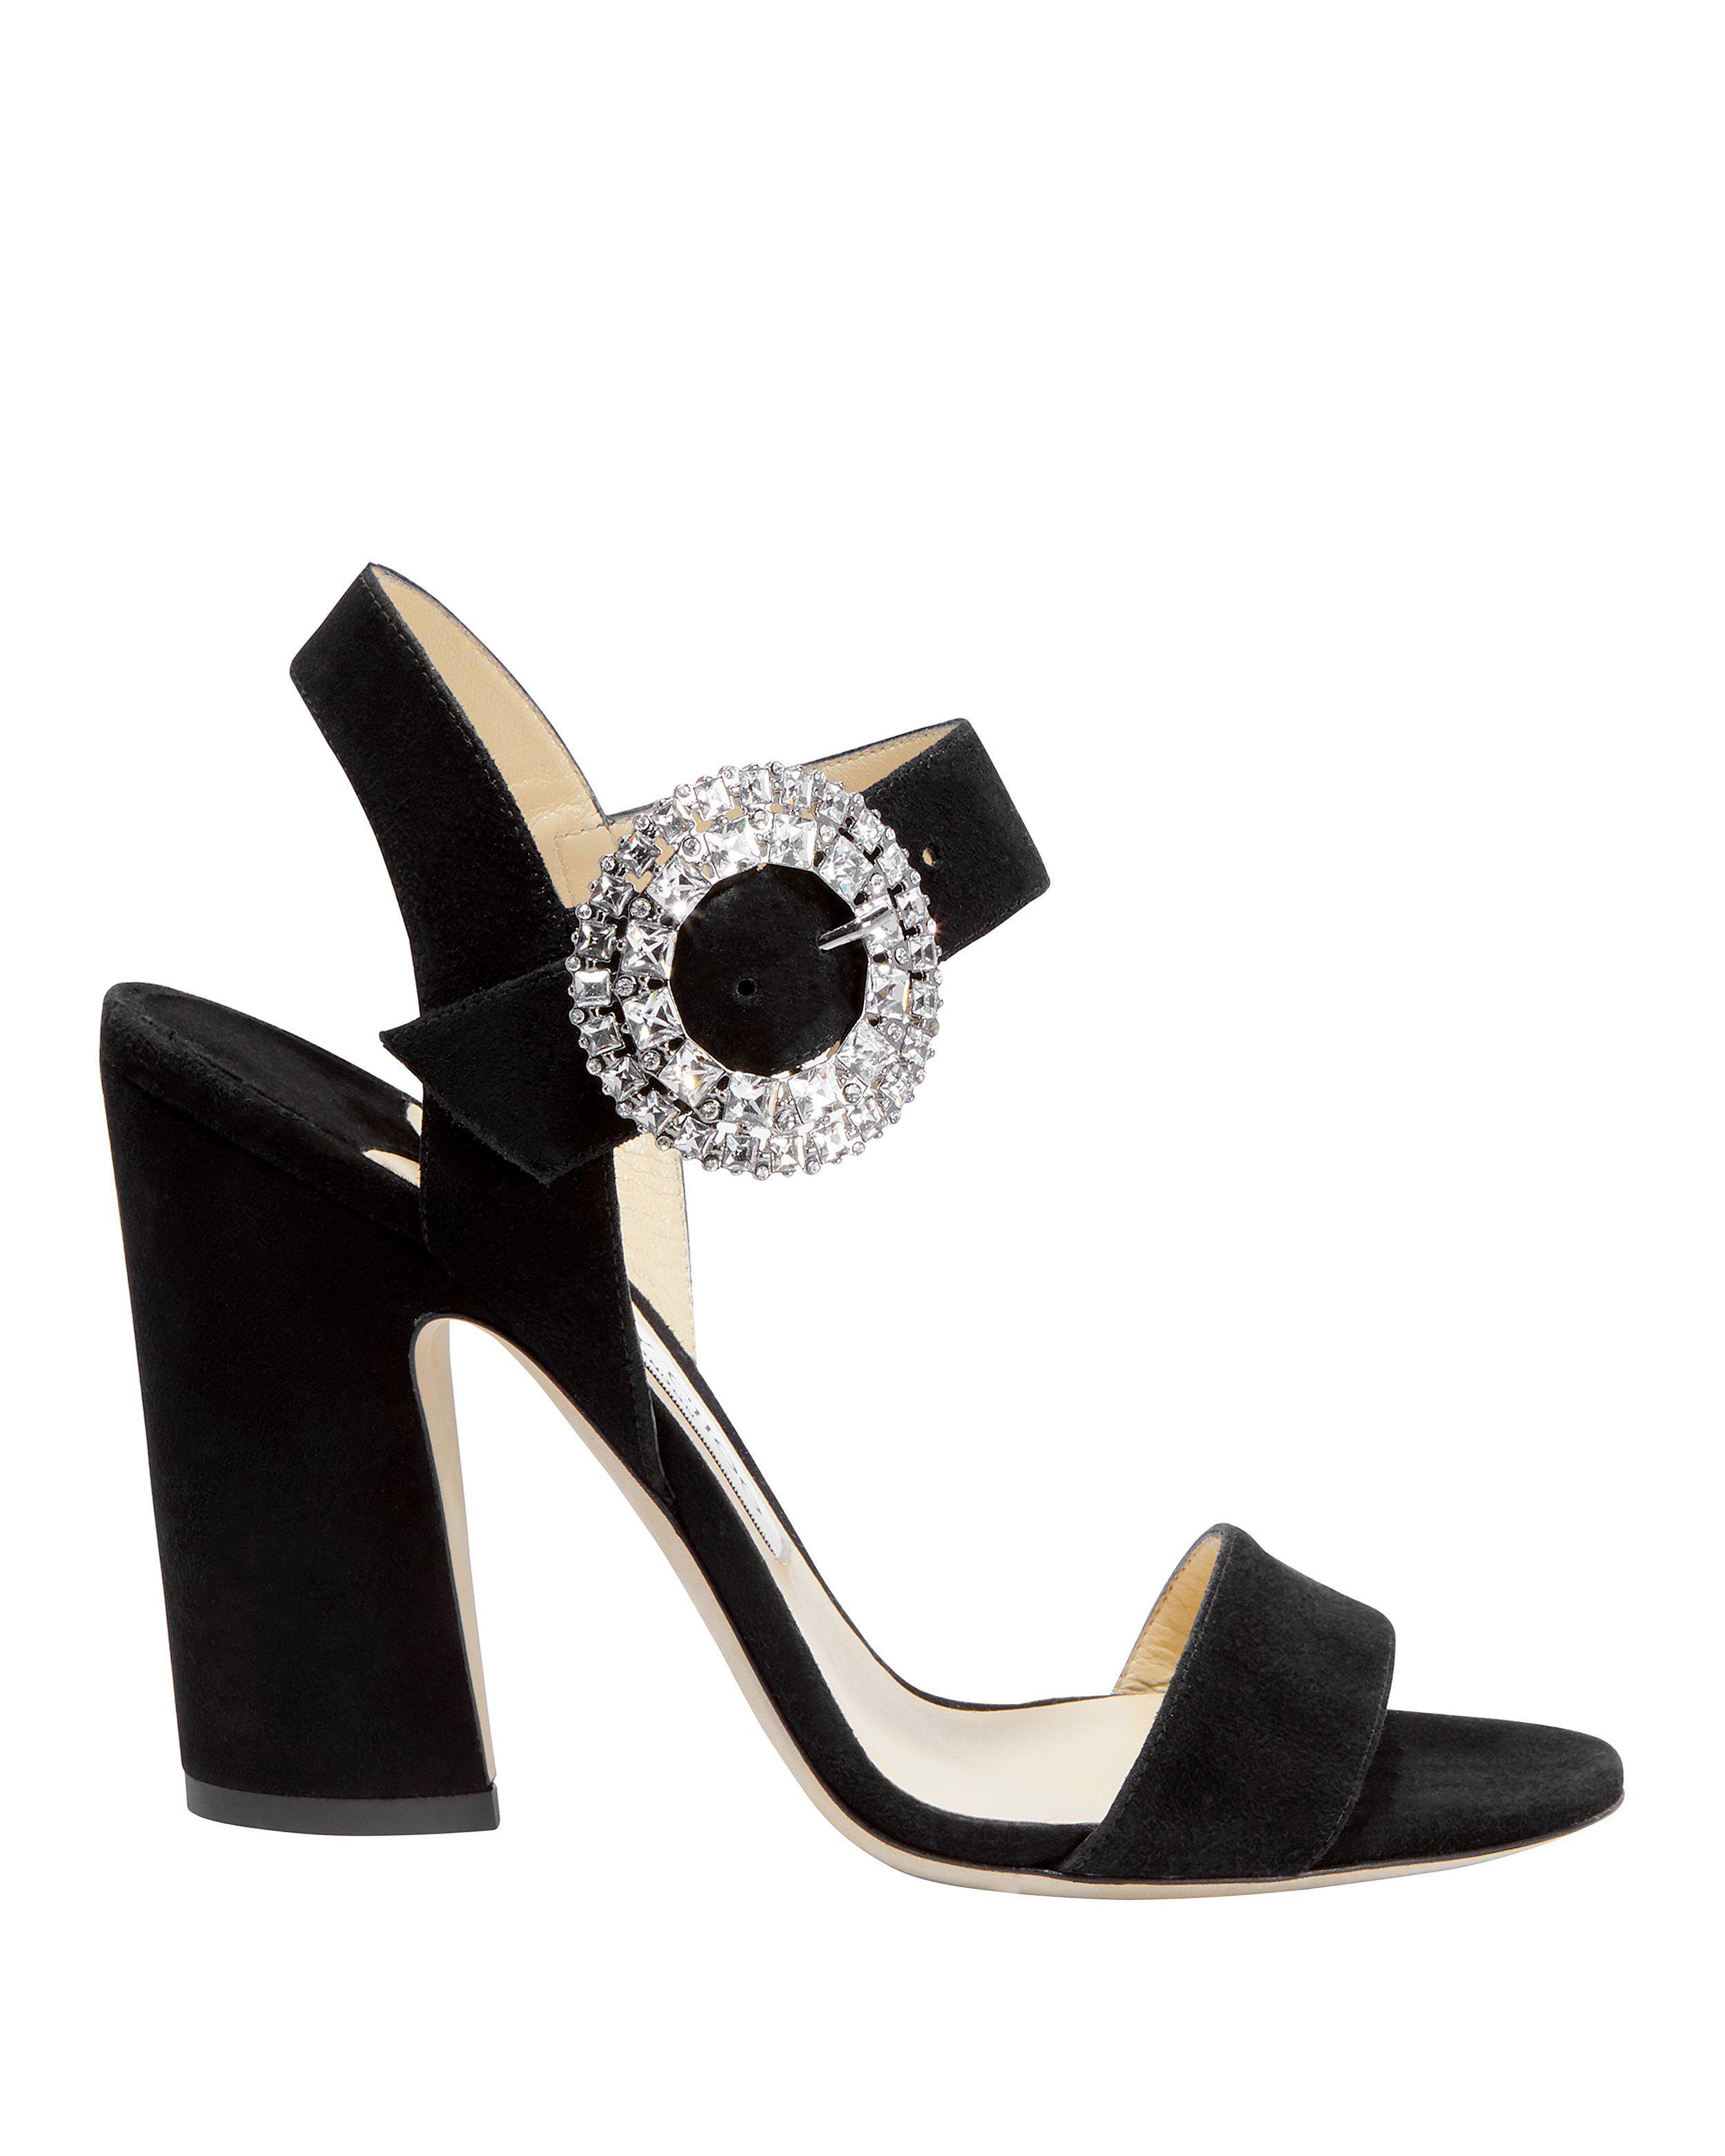 Mischa 100 sandals - Black Jimmy Choo London UT4Zz8X0dO